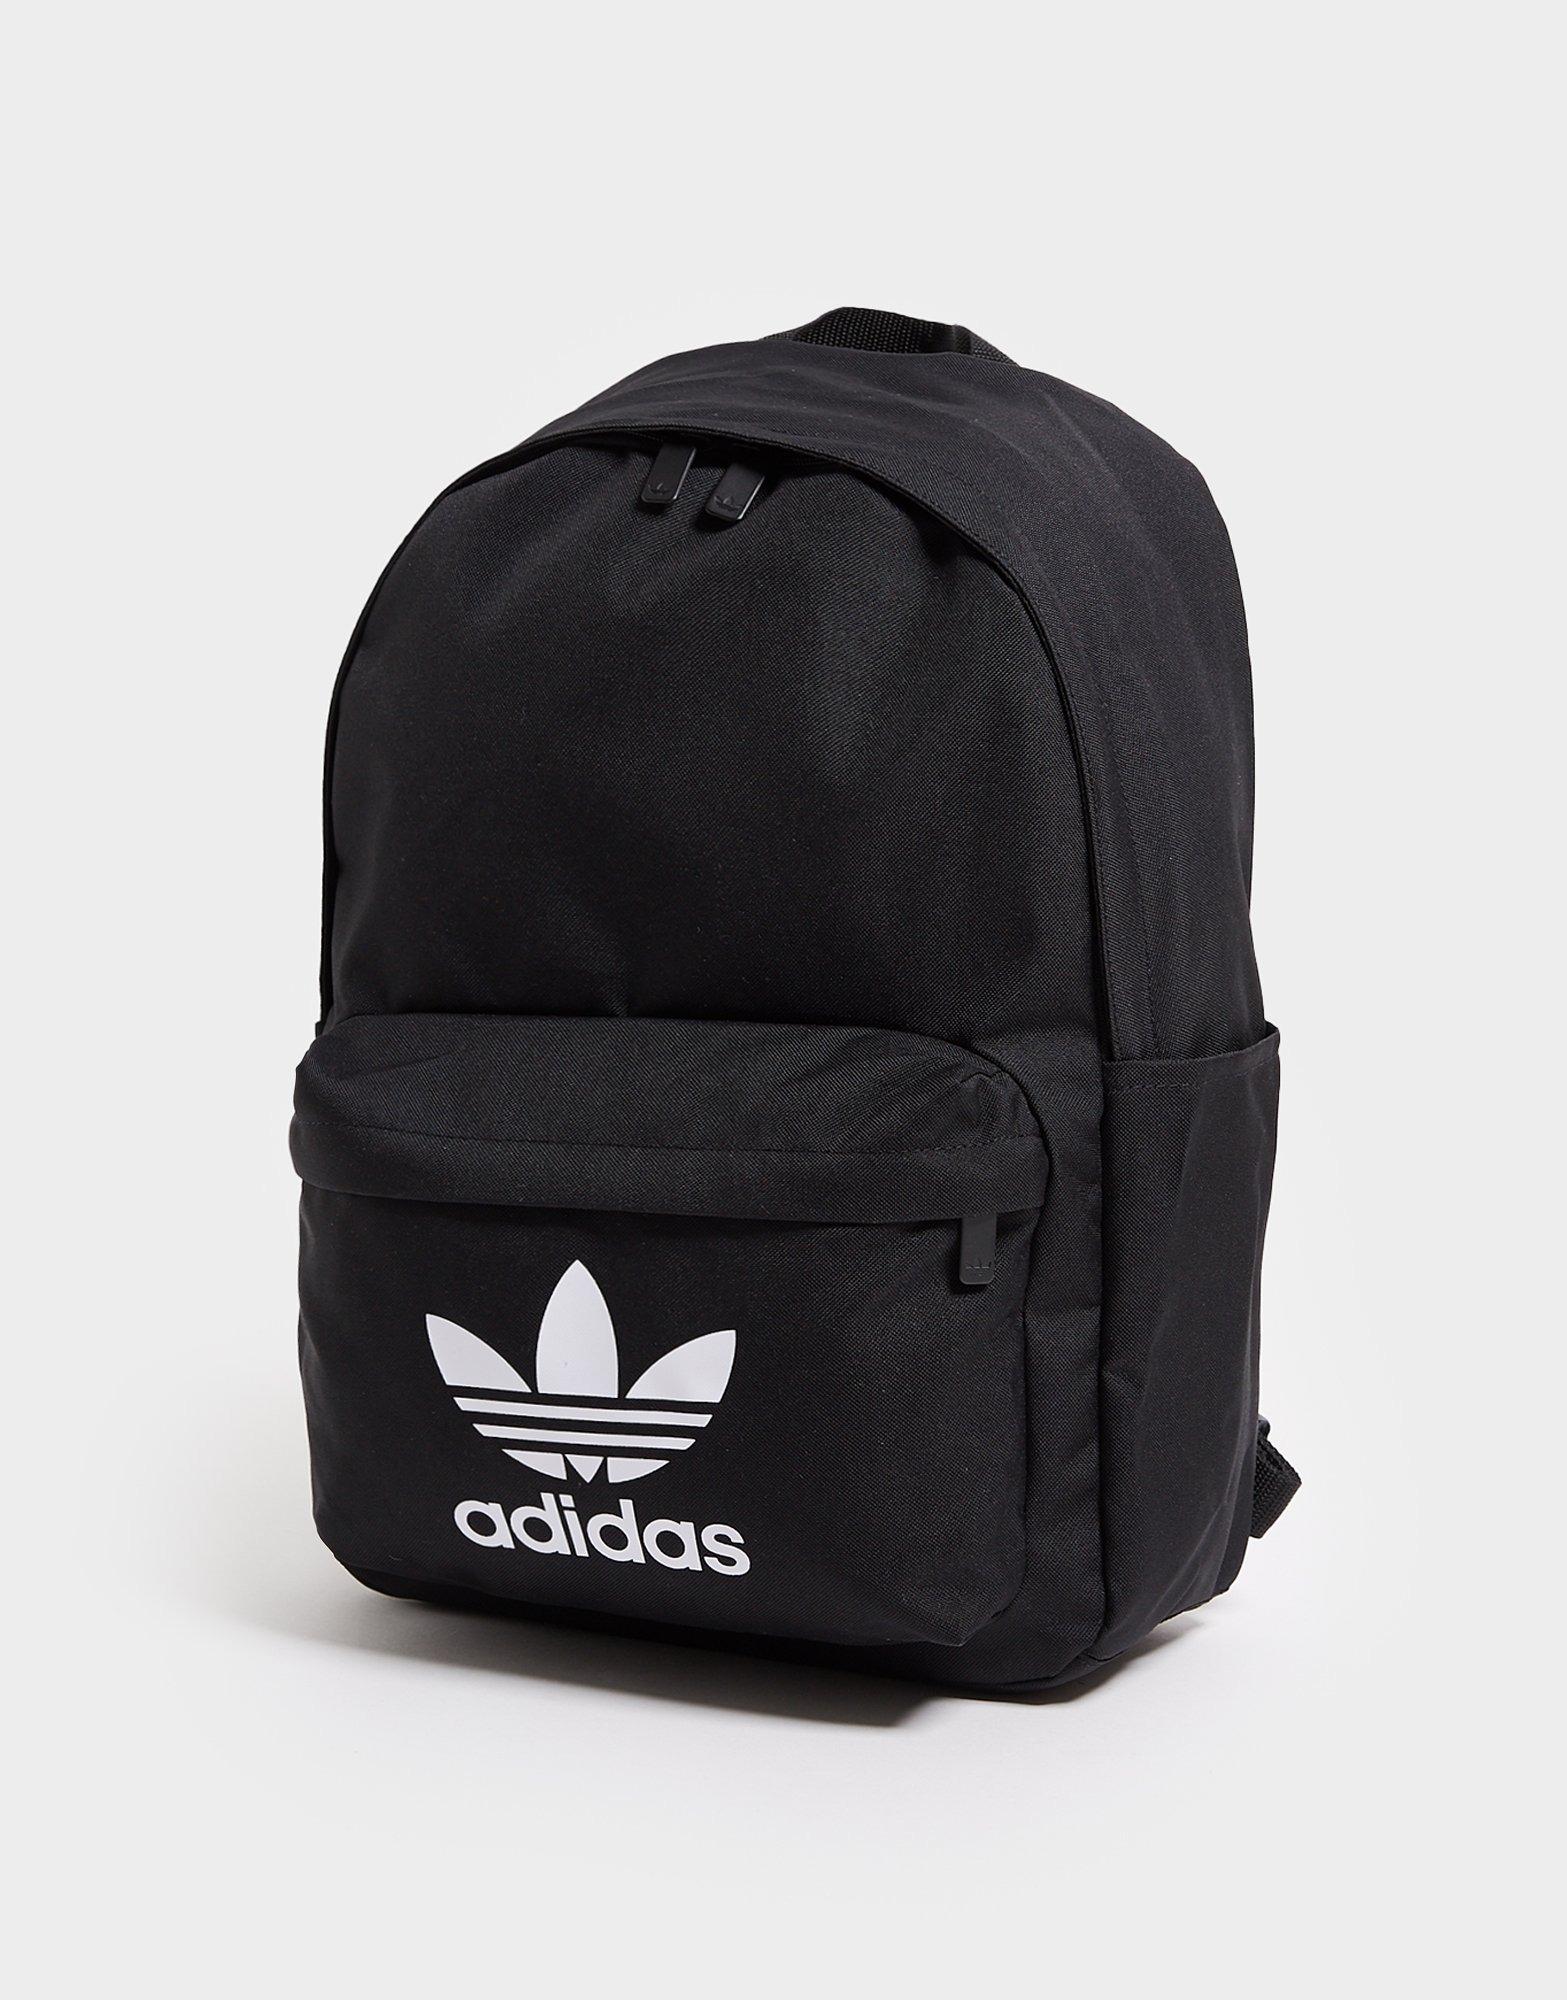 adidas Originals Classic Backpack   JD Sports